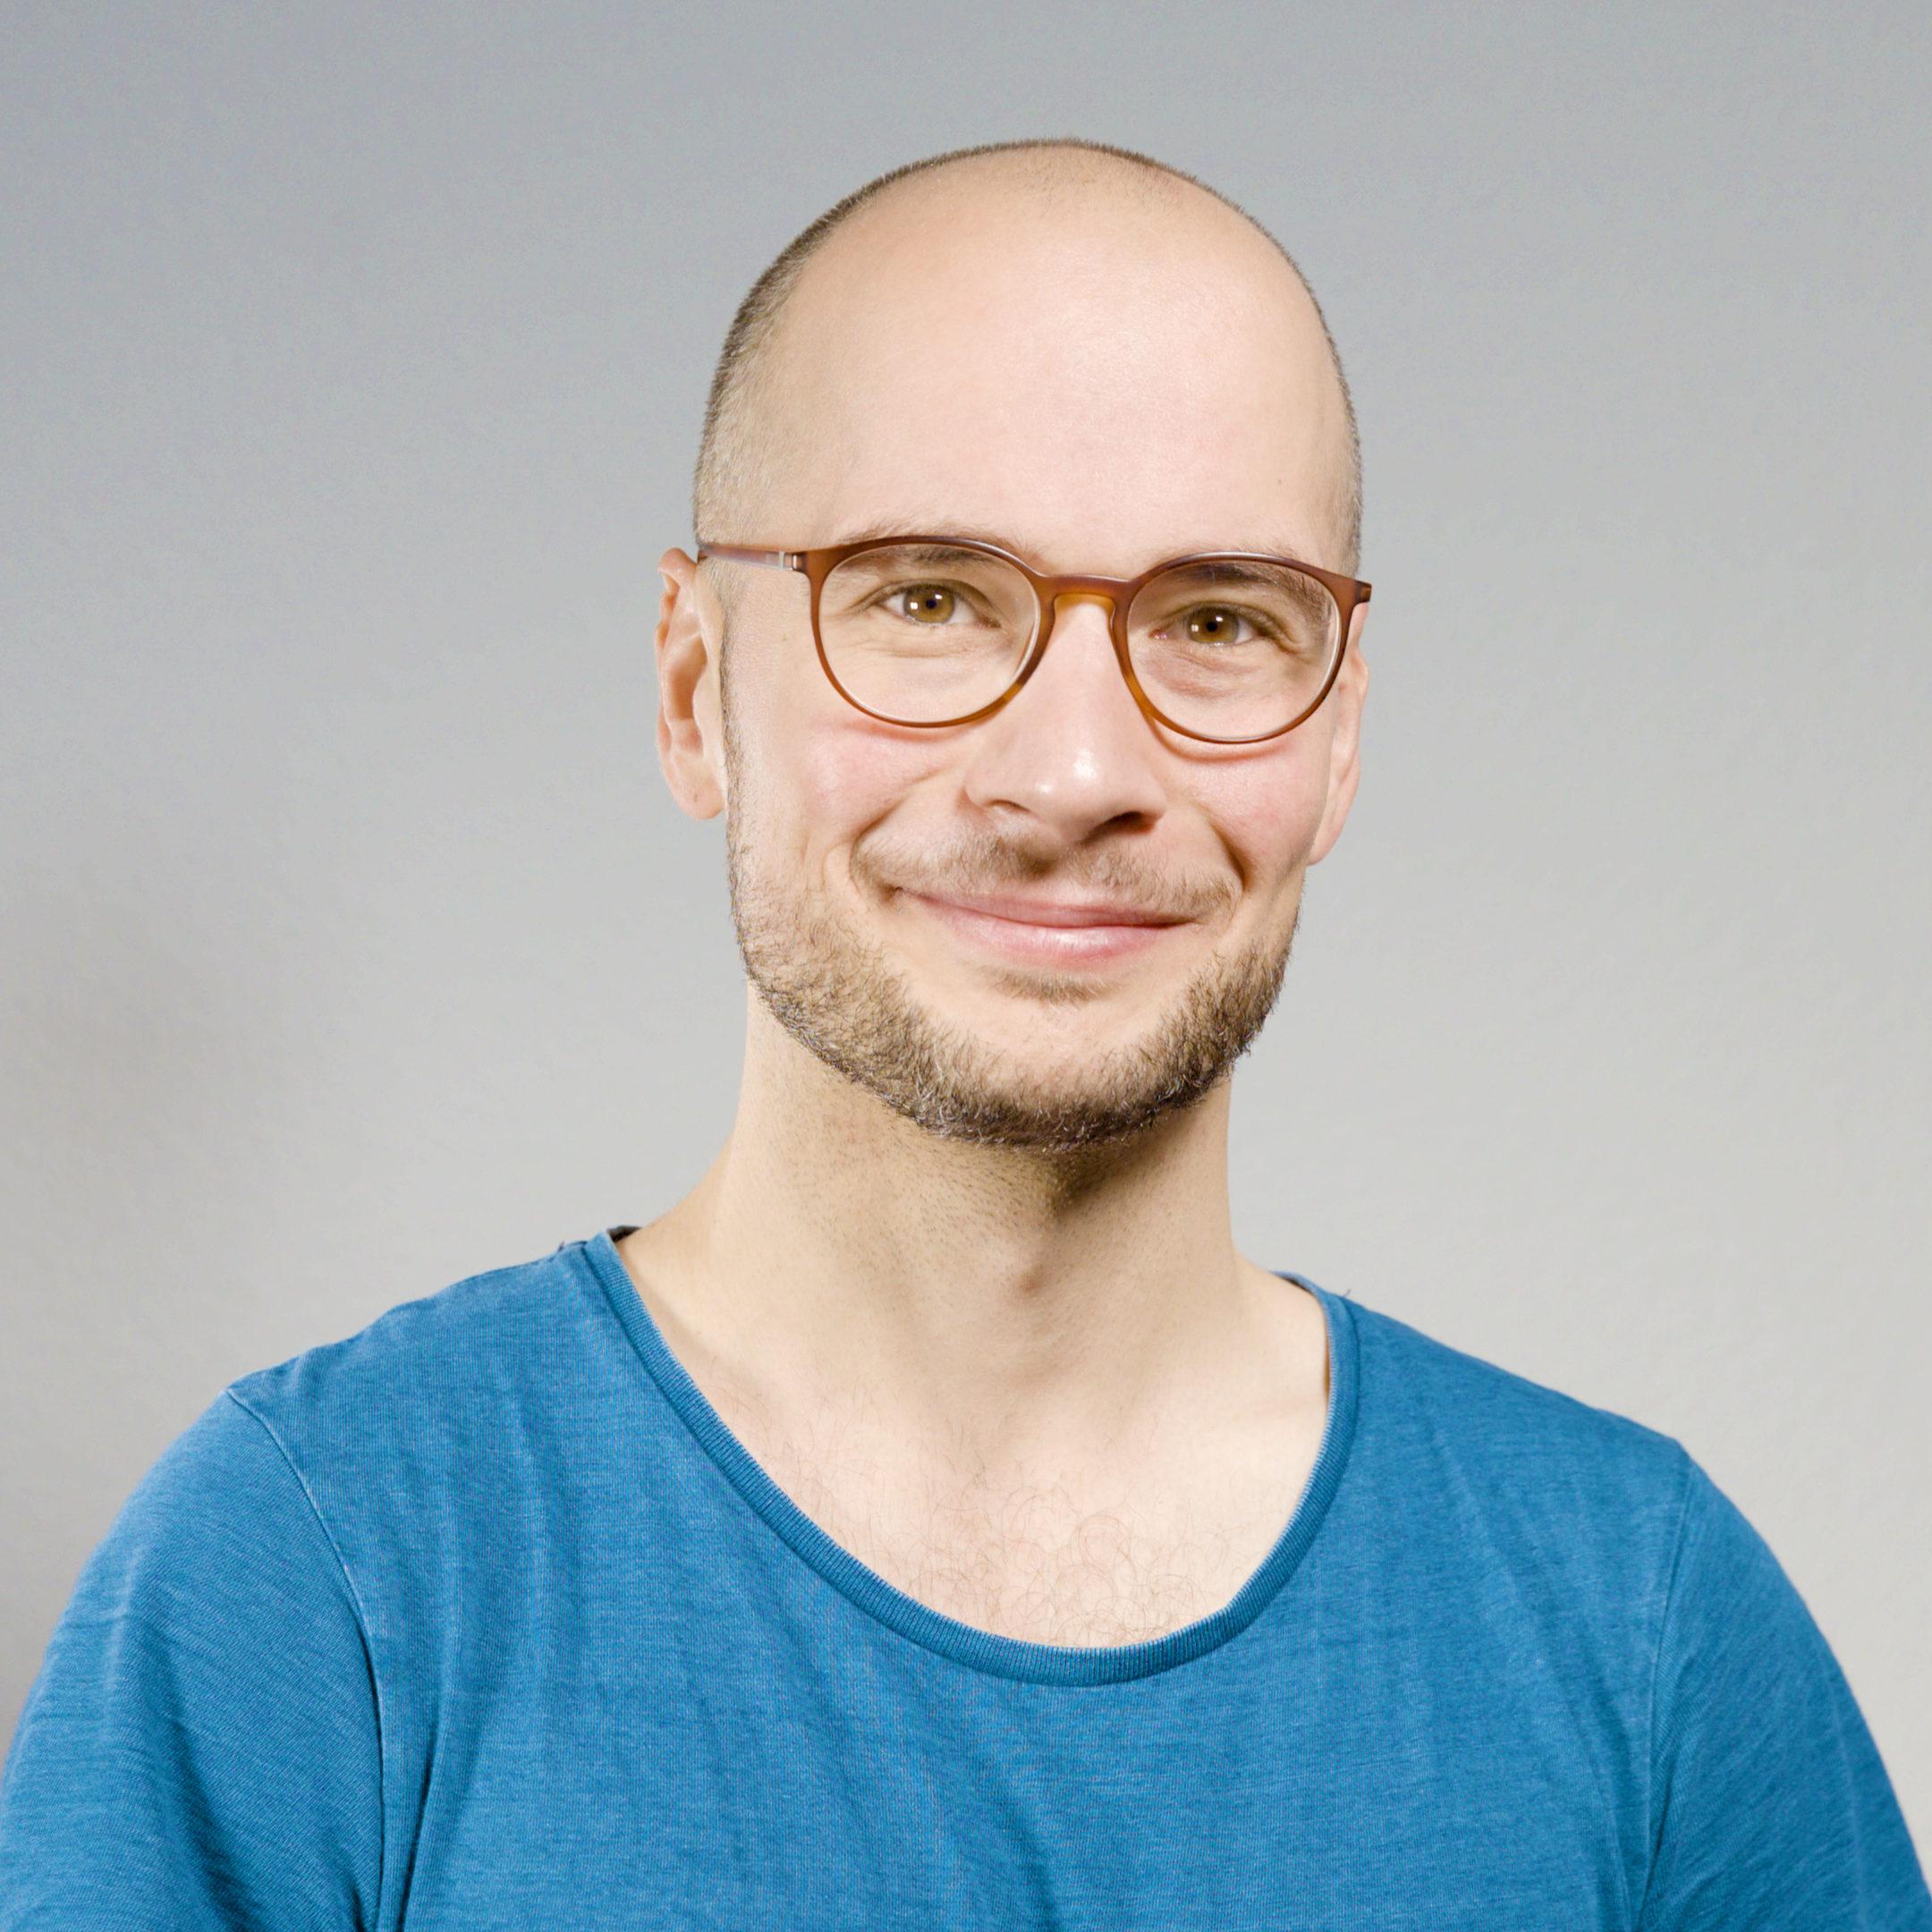 Benjamin Moritz Gronau